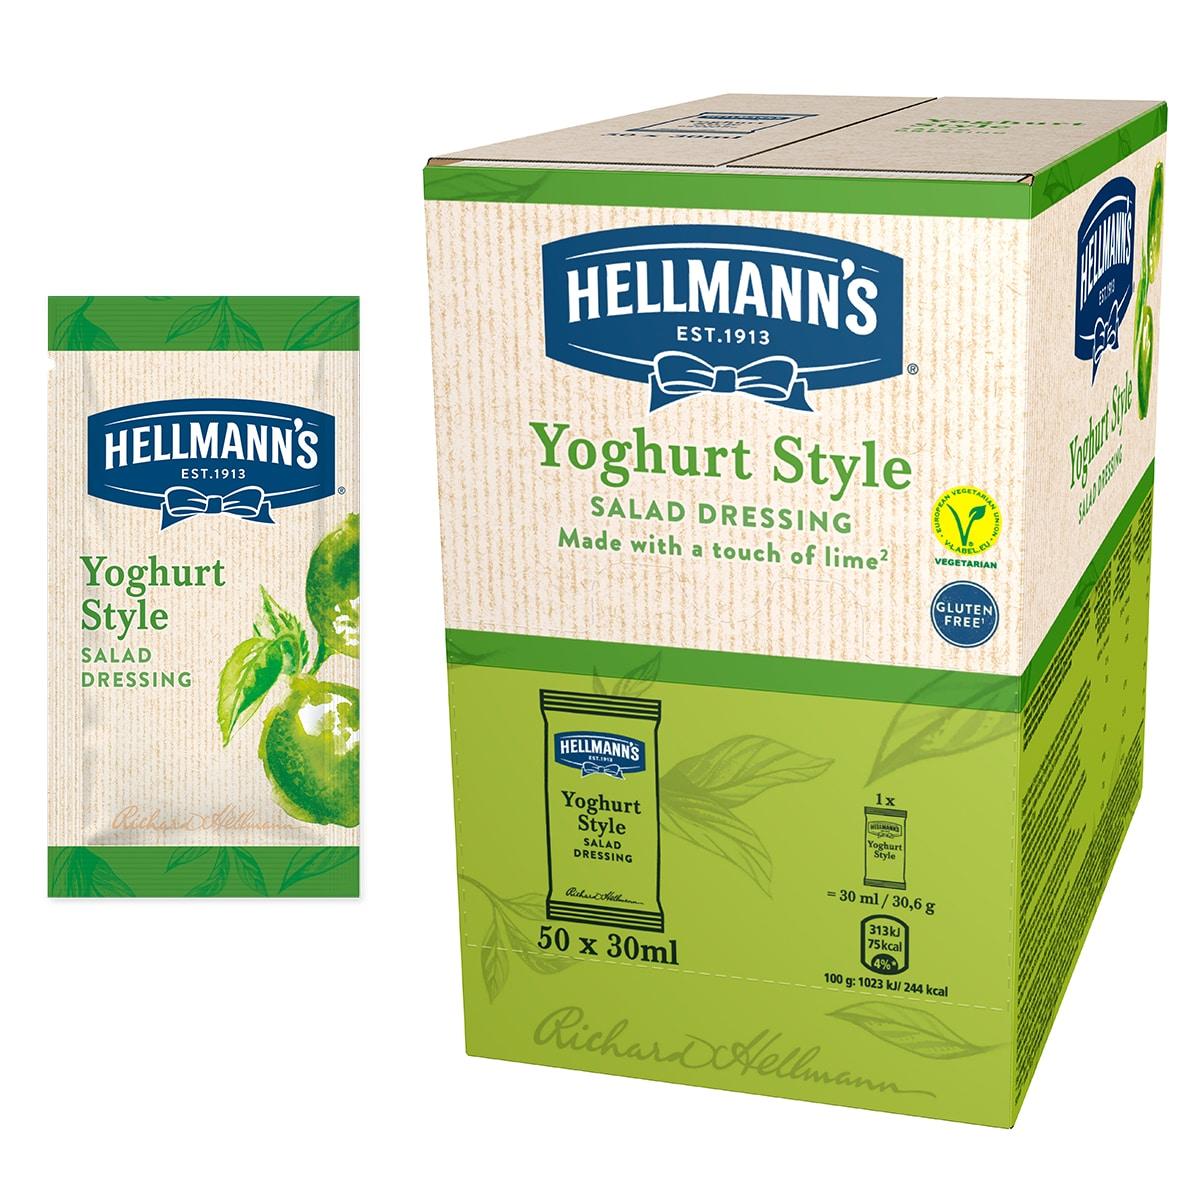 Hellmann's Solatni preliv z okusom jogurta in limete 30 ml